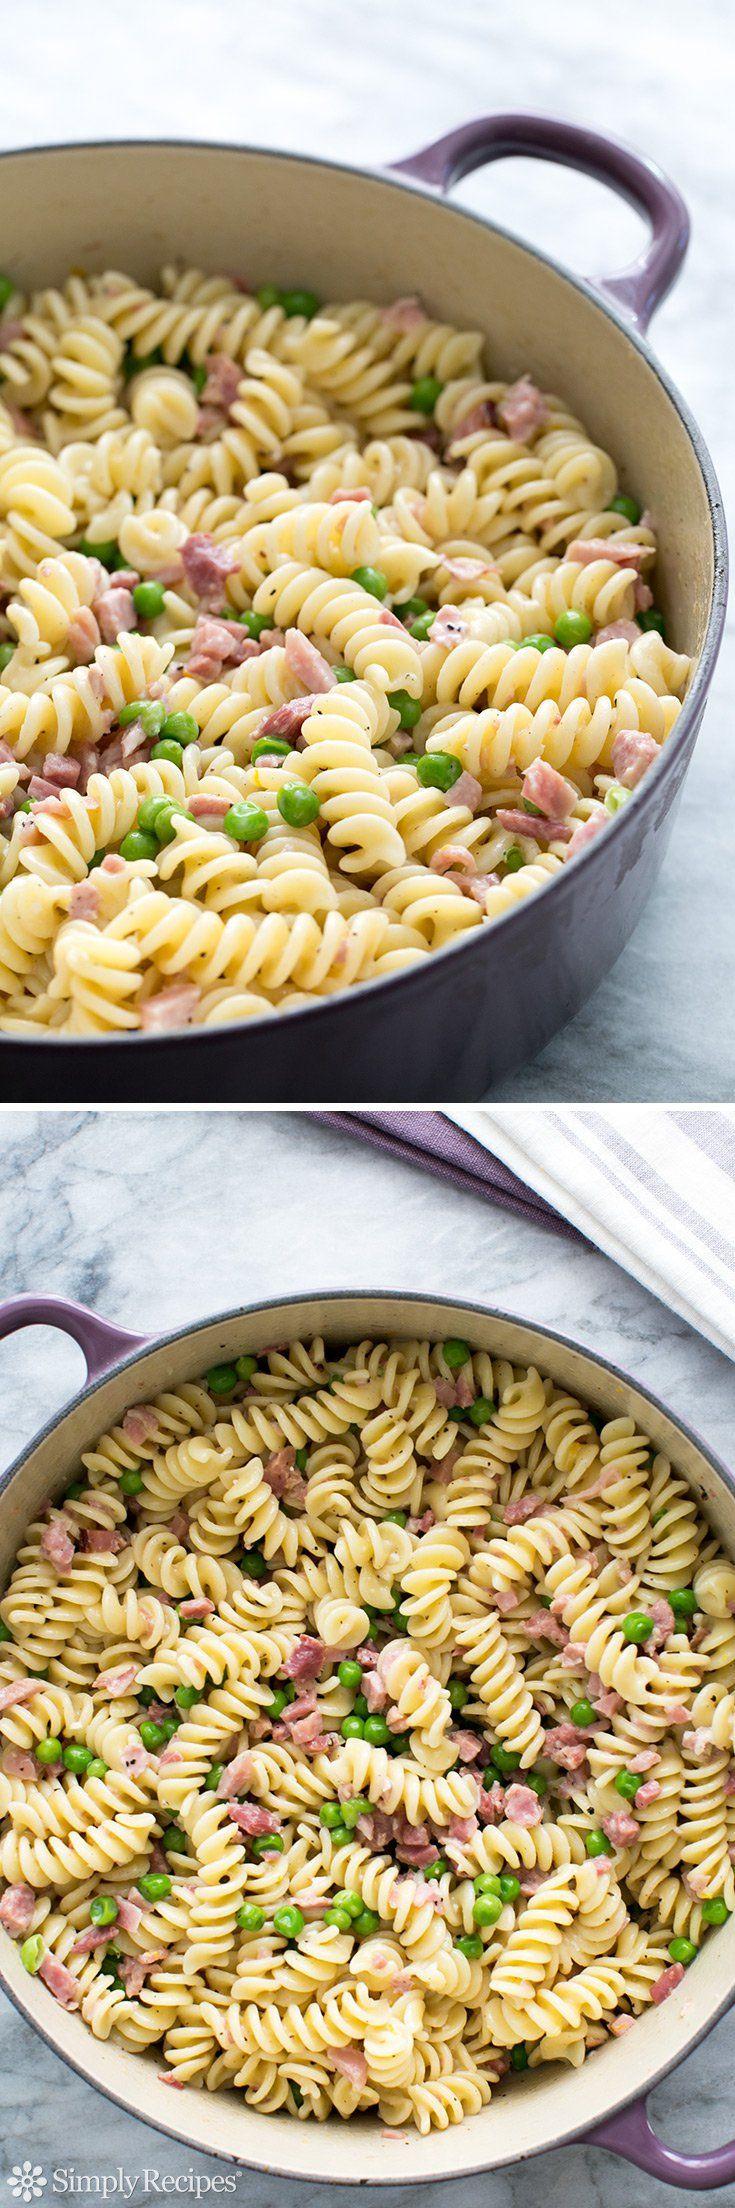 Toddler pasta salad recipe